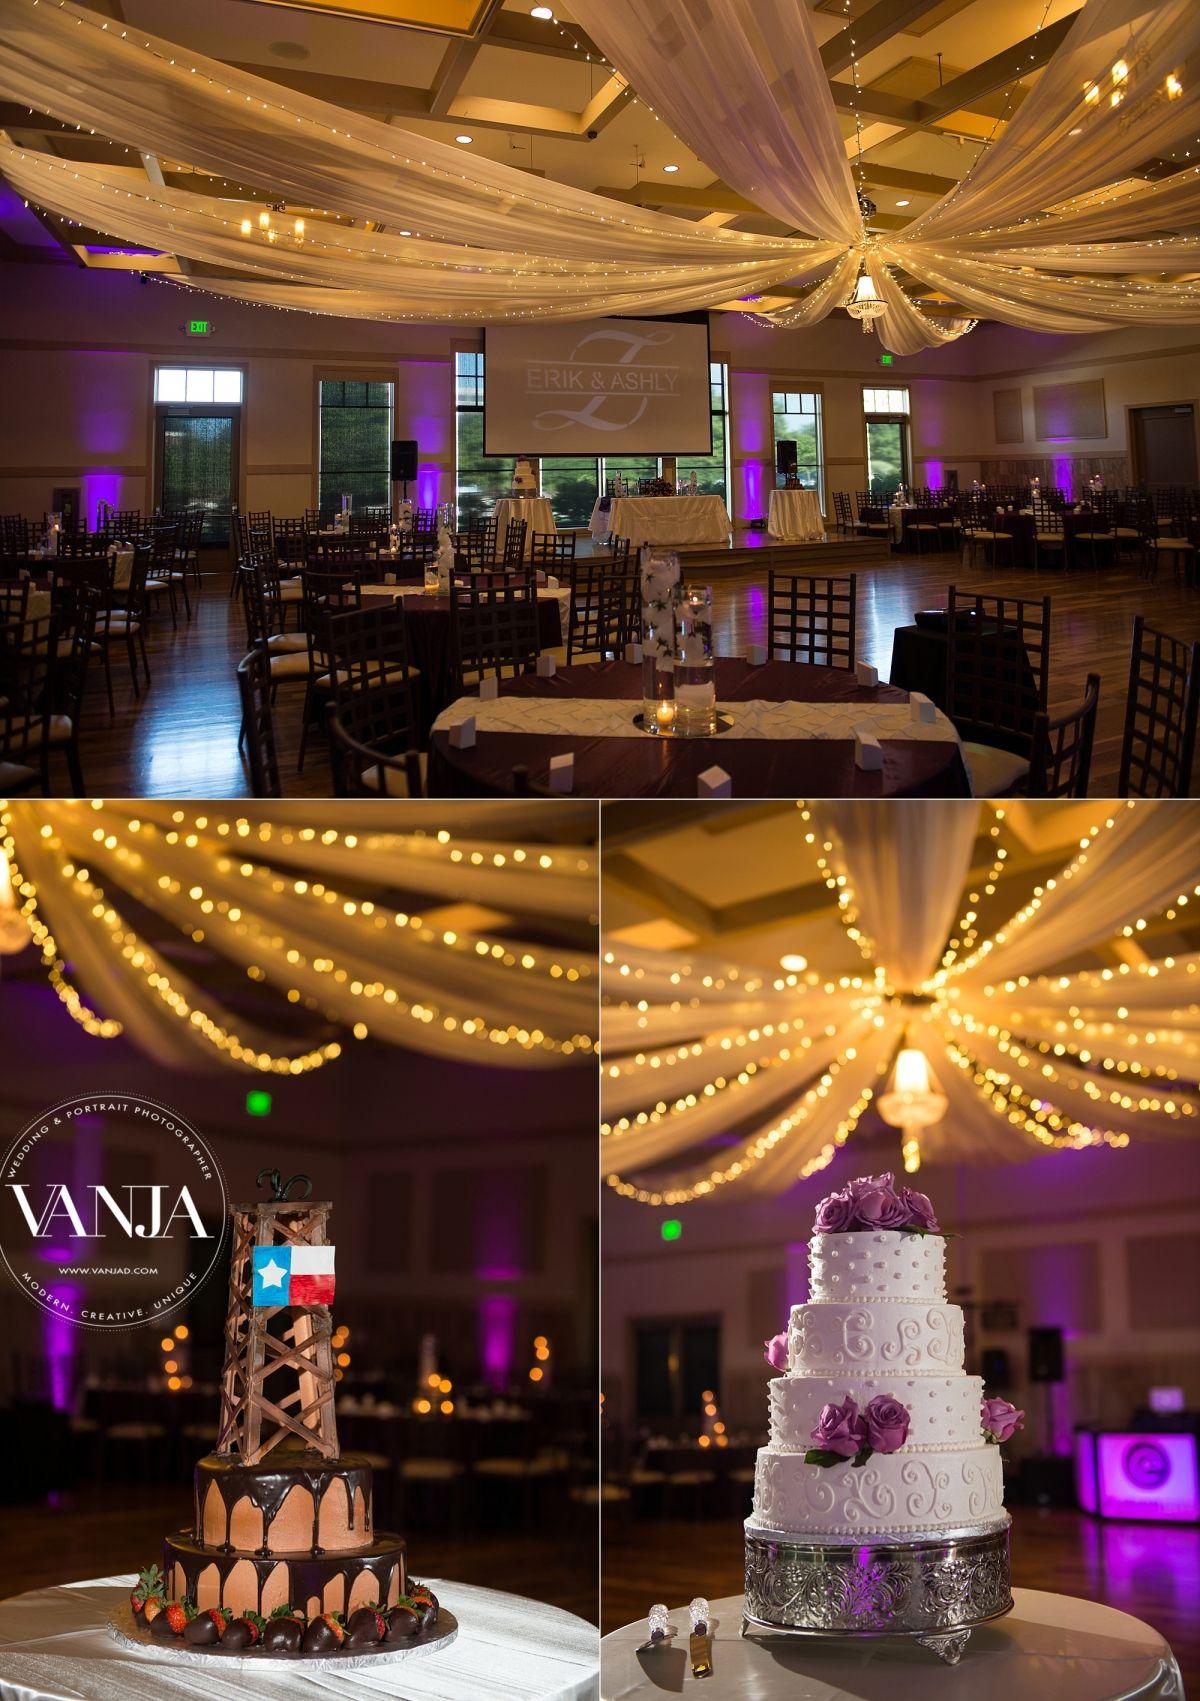 Noah S Event Center Irving Las Colinas Wedding Gorgeous Reception Hall Setup With Beautiful Chandelier Drape